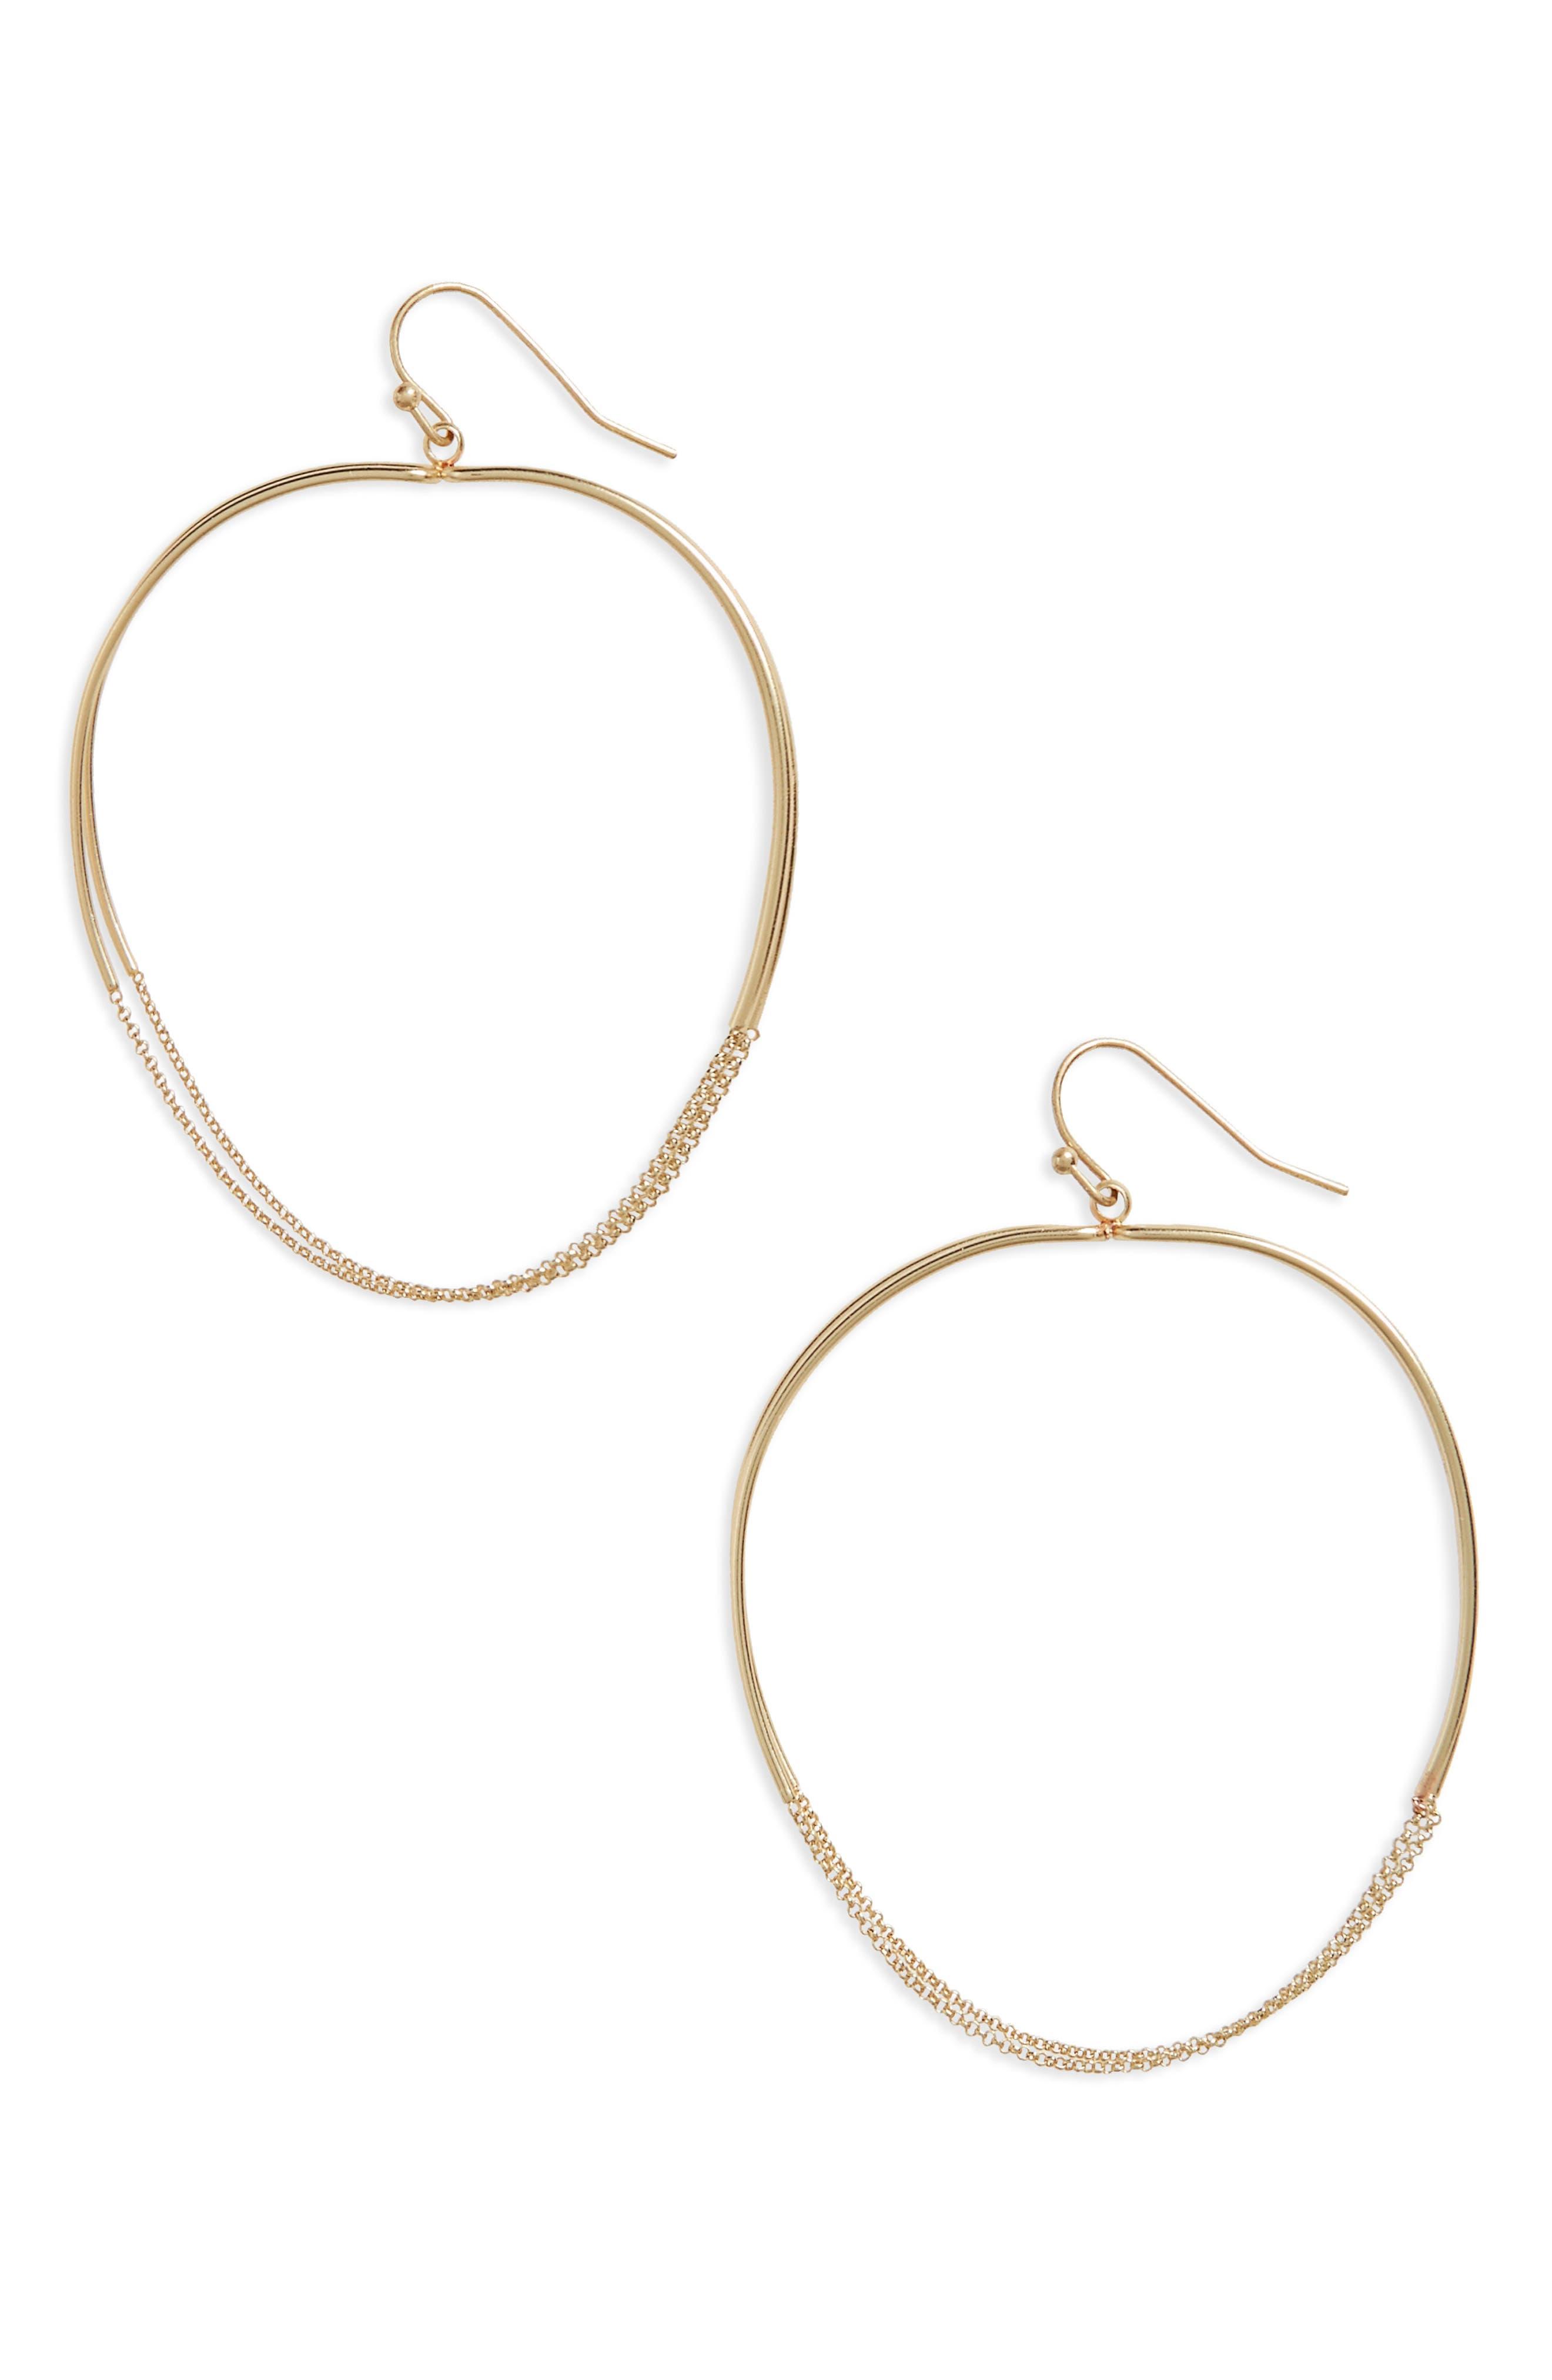 Canvas Jewelry Large Chain Detail Hoop Earrings